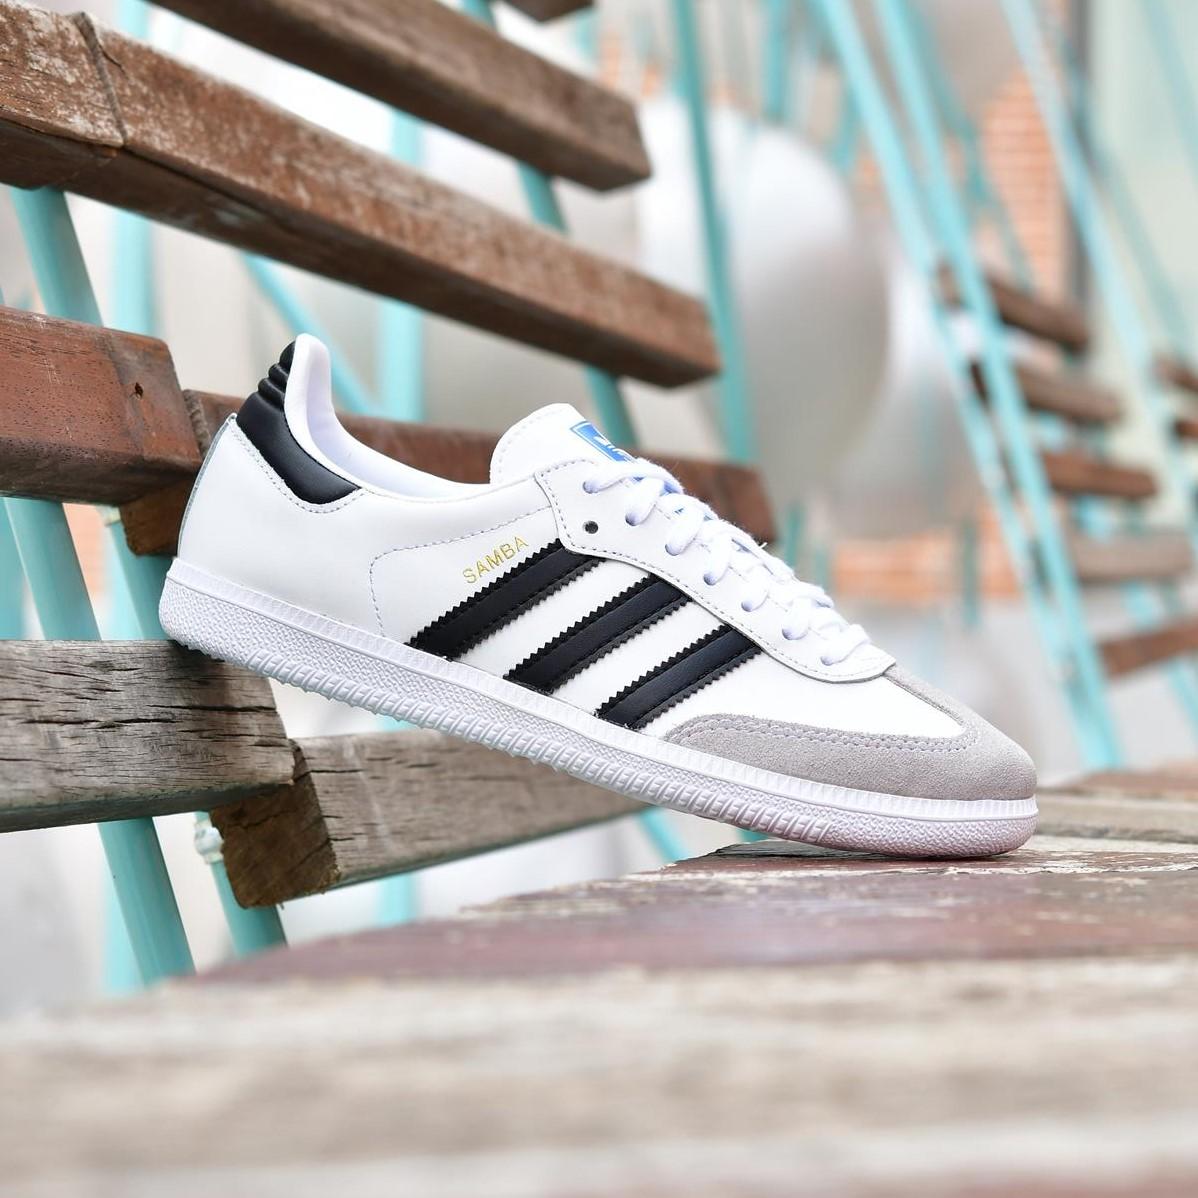 Spain Calzado Tod In Para Made Sneakers amp; Amorshoes s xqwCB4qa